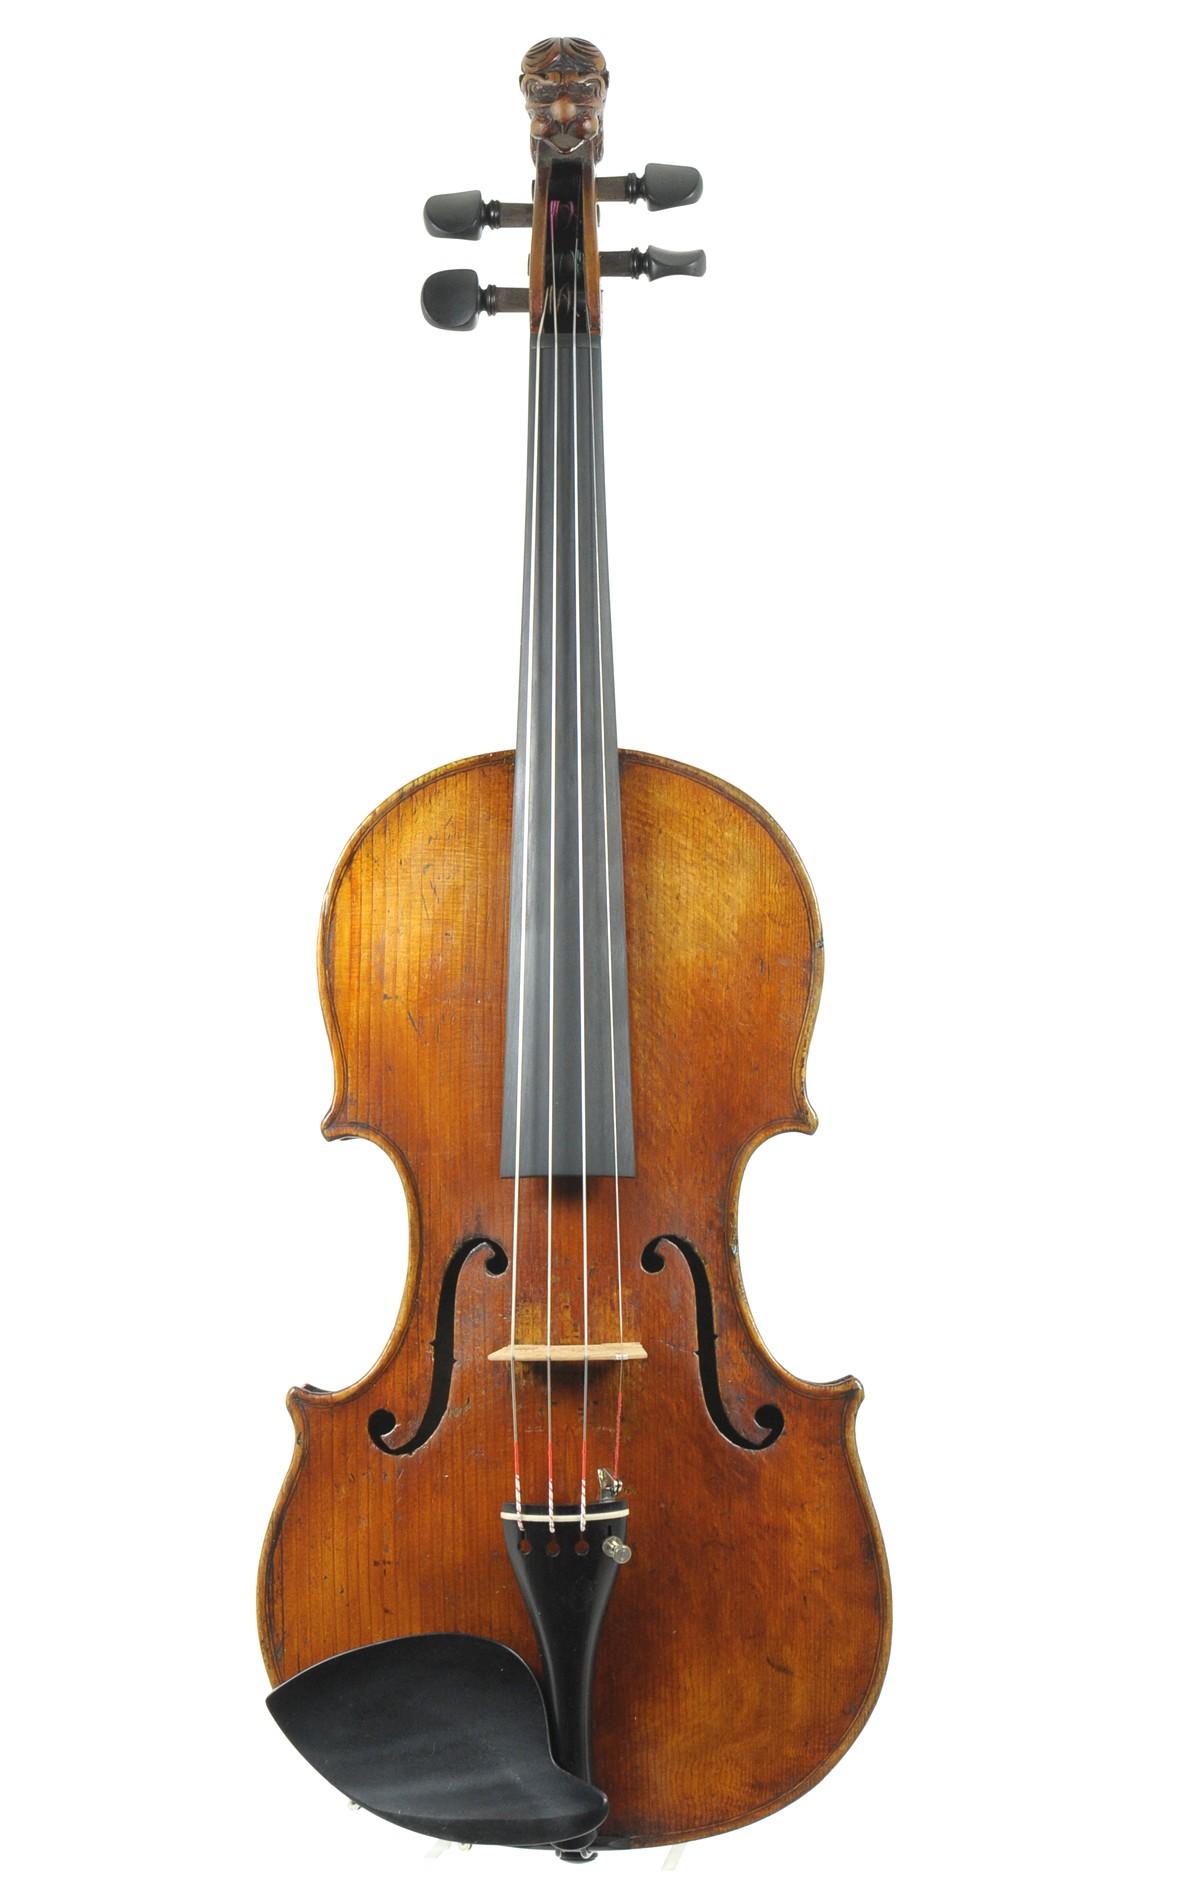 Lion head violin, England approx. 1850 - top